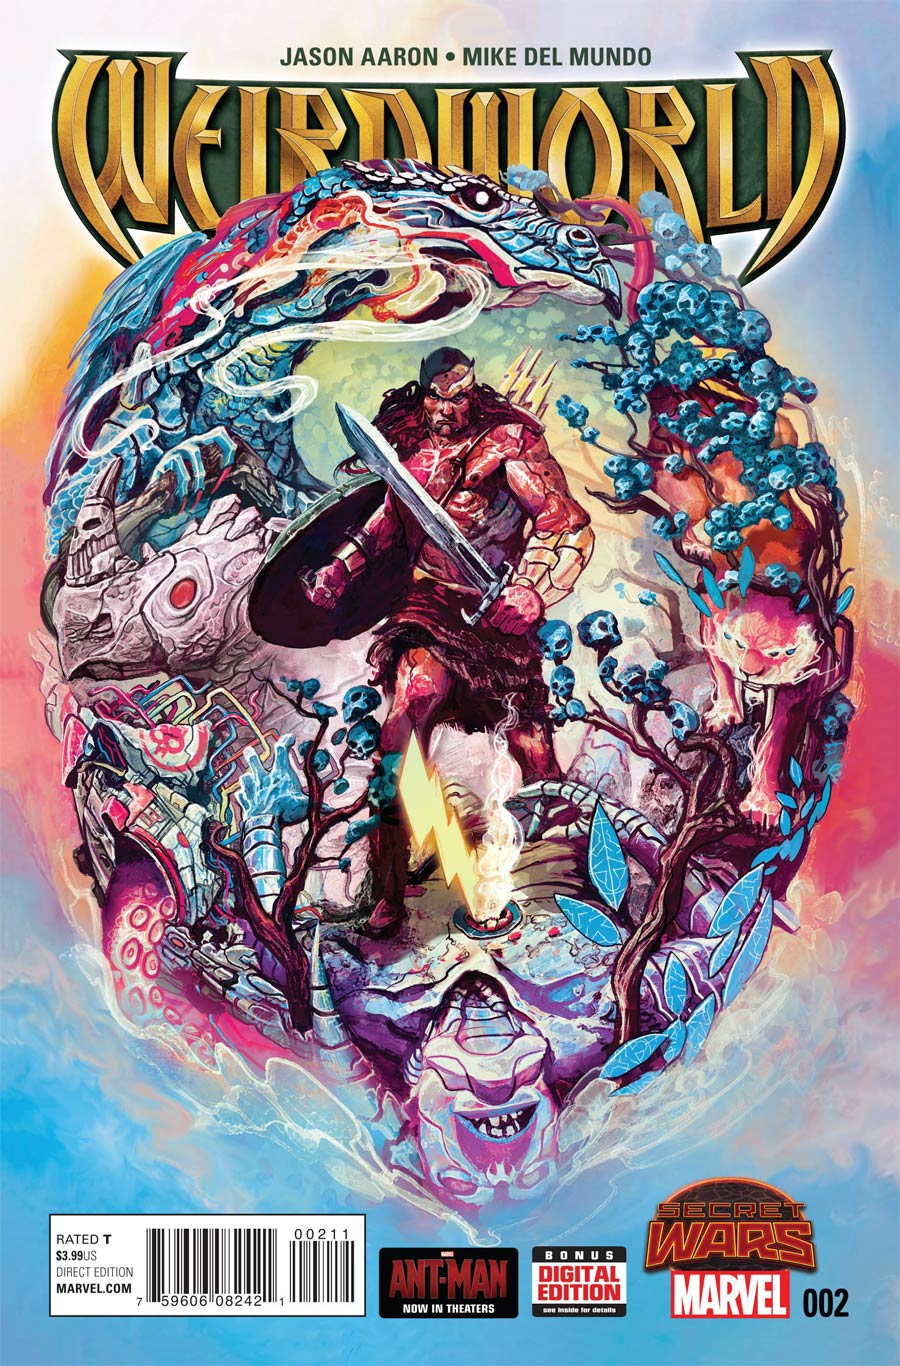 Weirdworld #2 Cover A Regular Michael Del Mundo Cover (Secret Wars Warzones Tie-In)